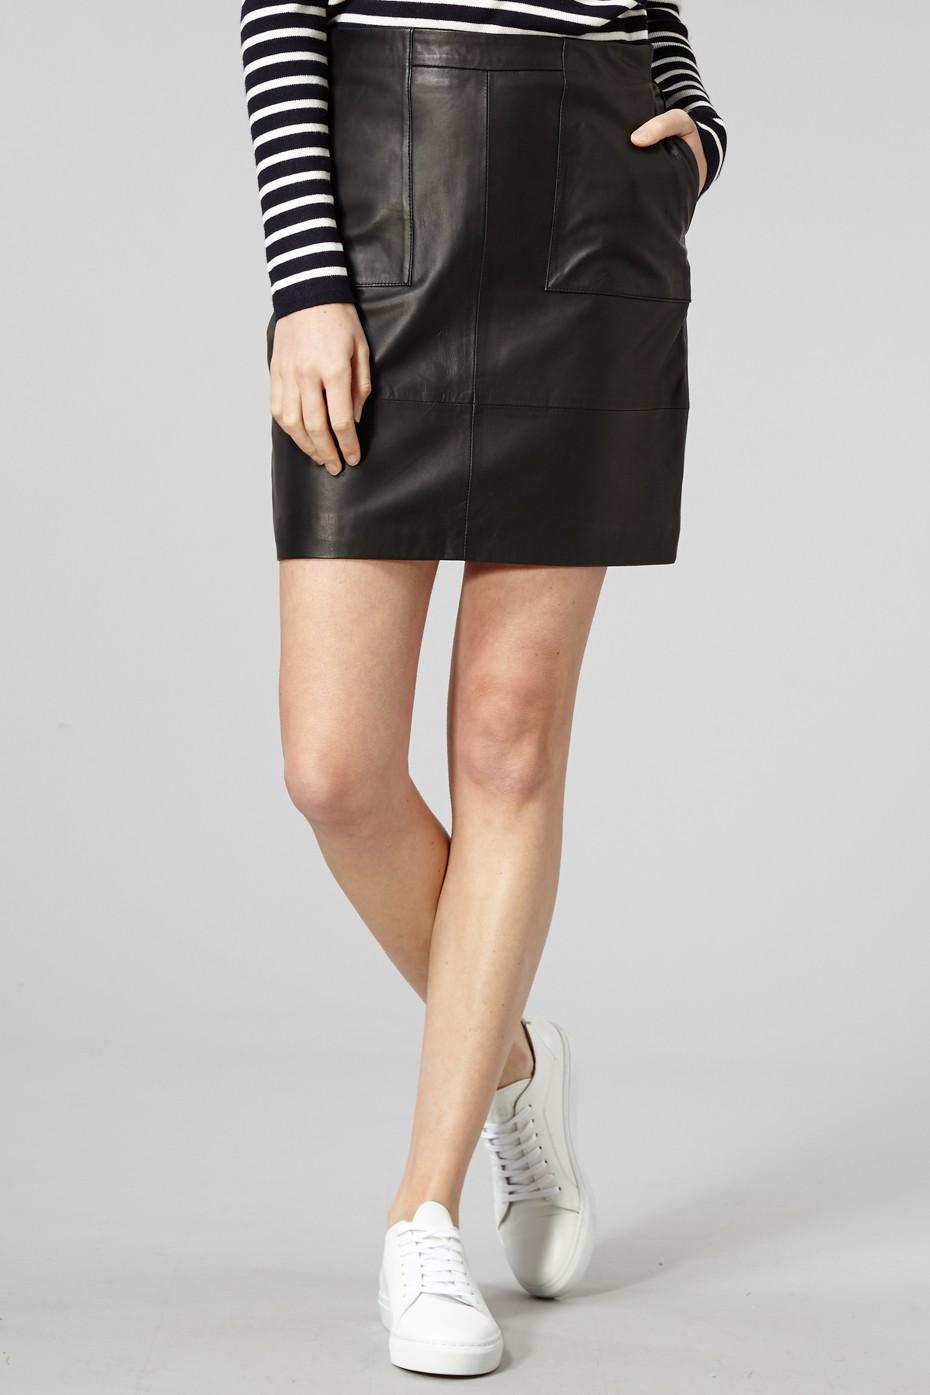 bd8bd3cb3e Trouva: Black Alberte Leather Skirt